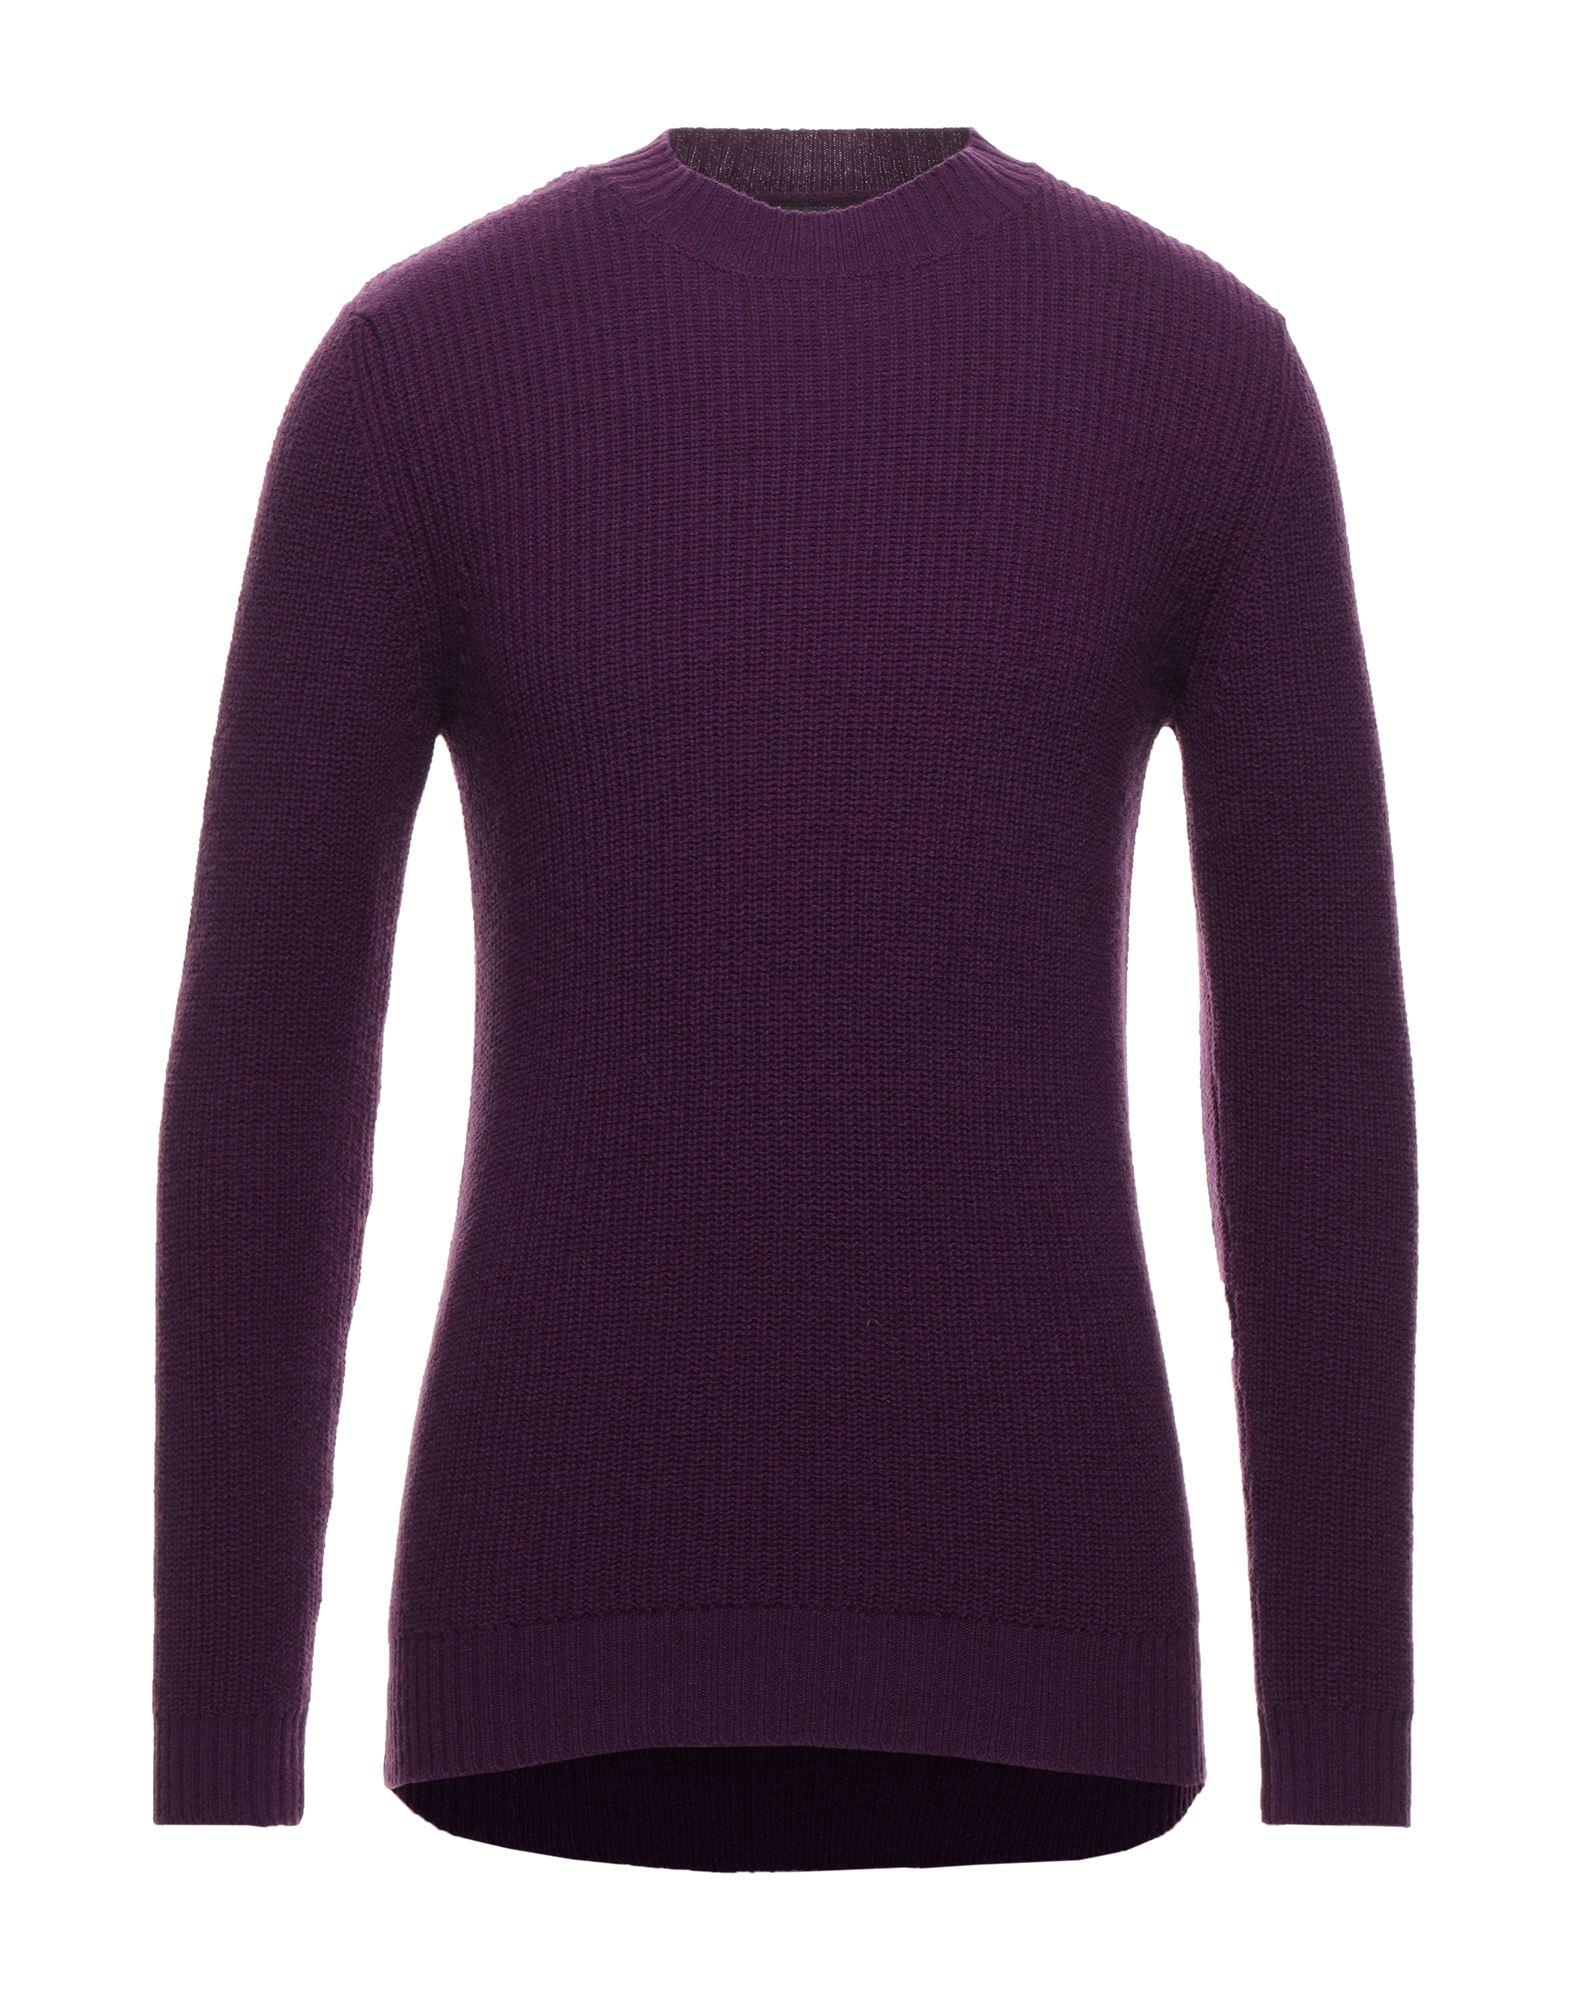 Le Mont St Michel Sweaters In Purple